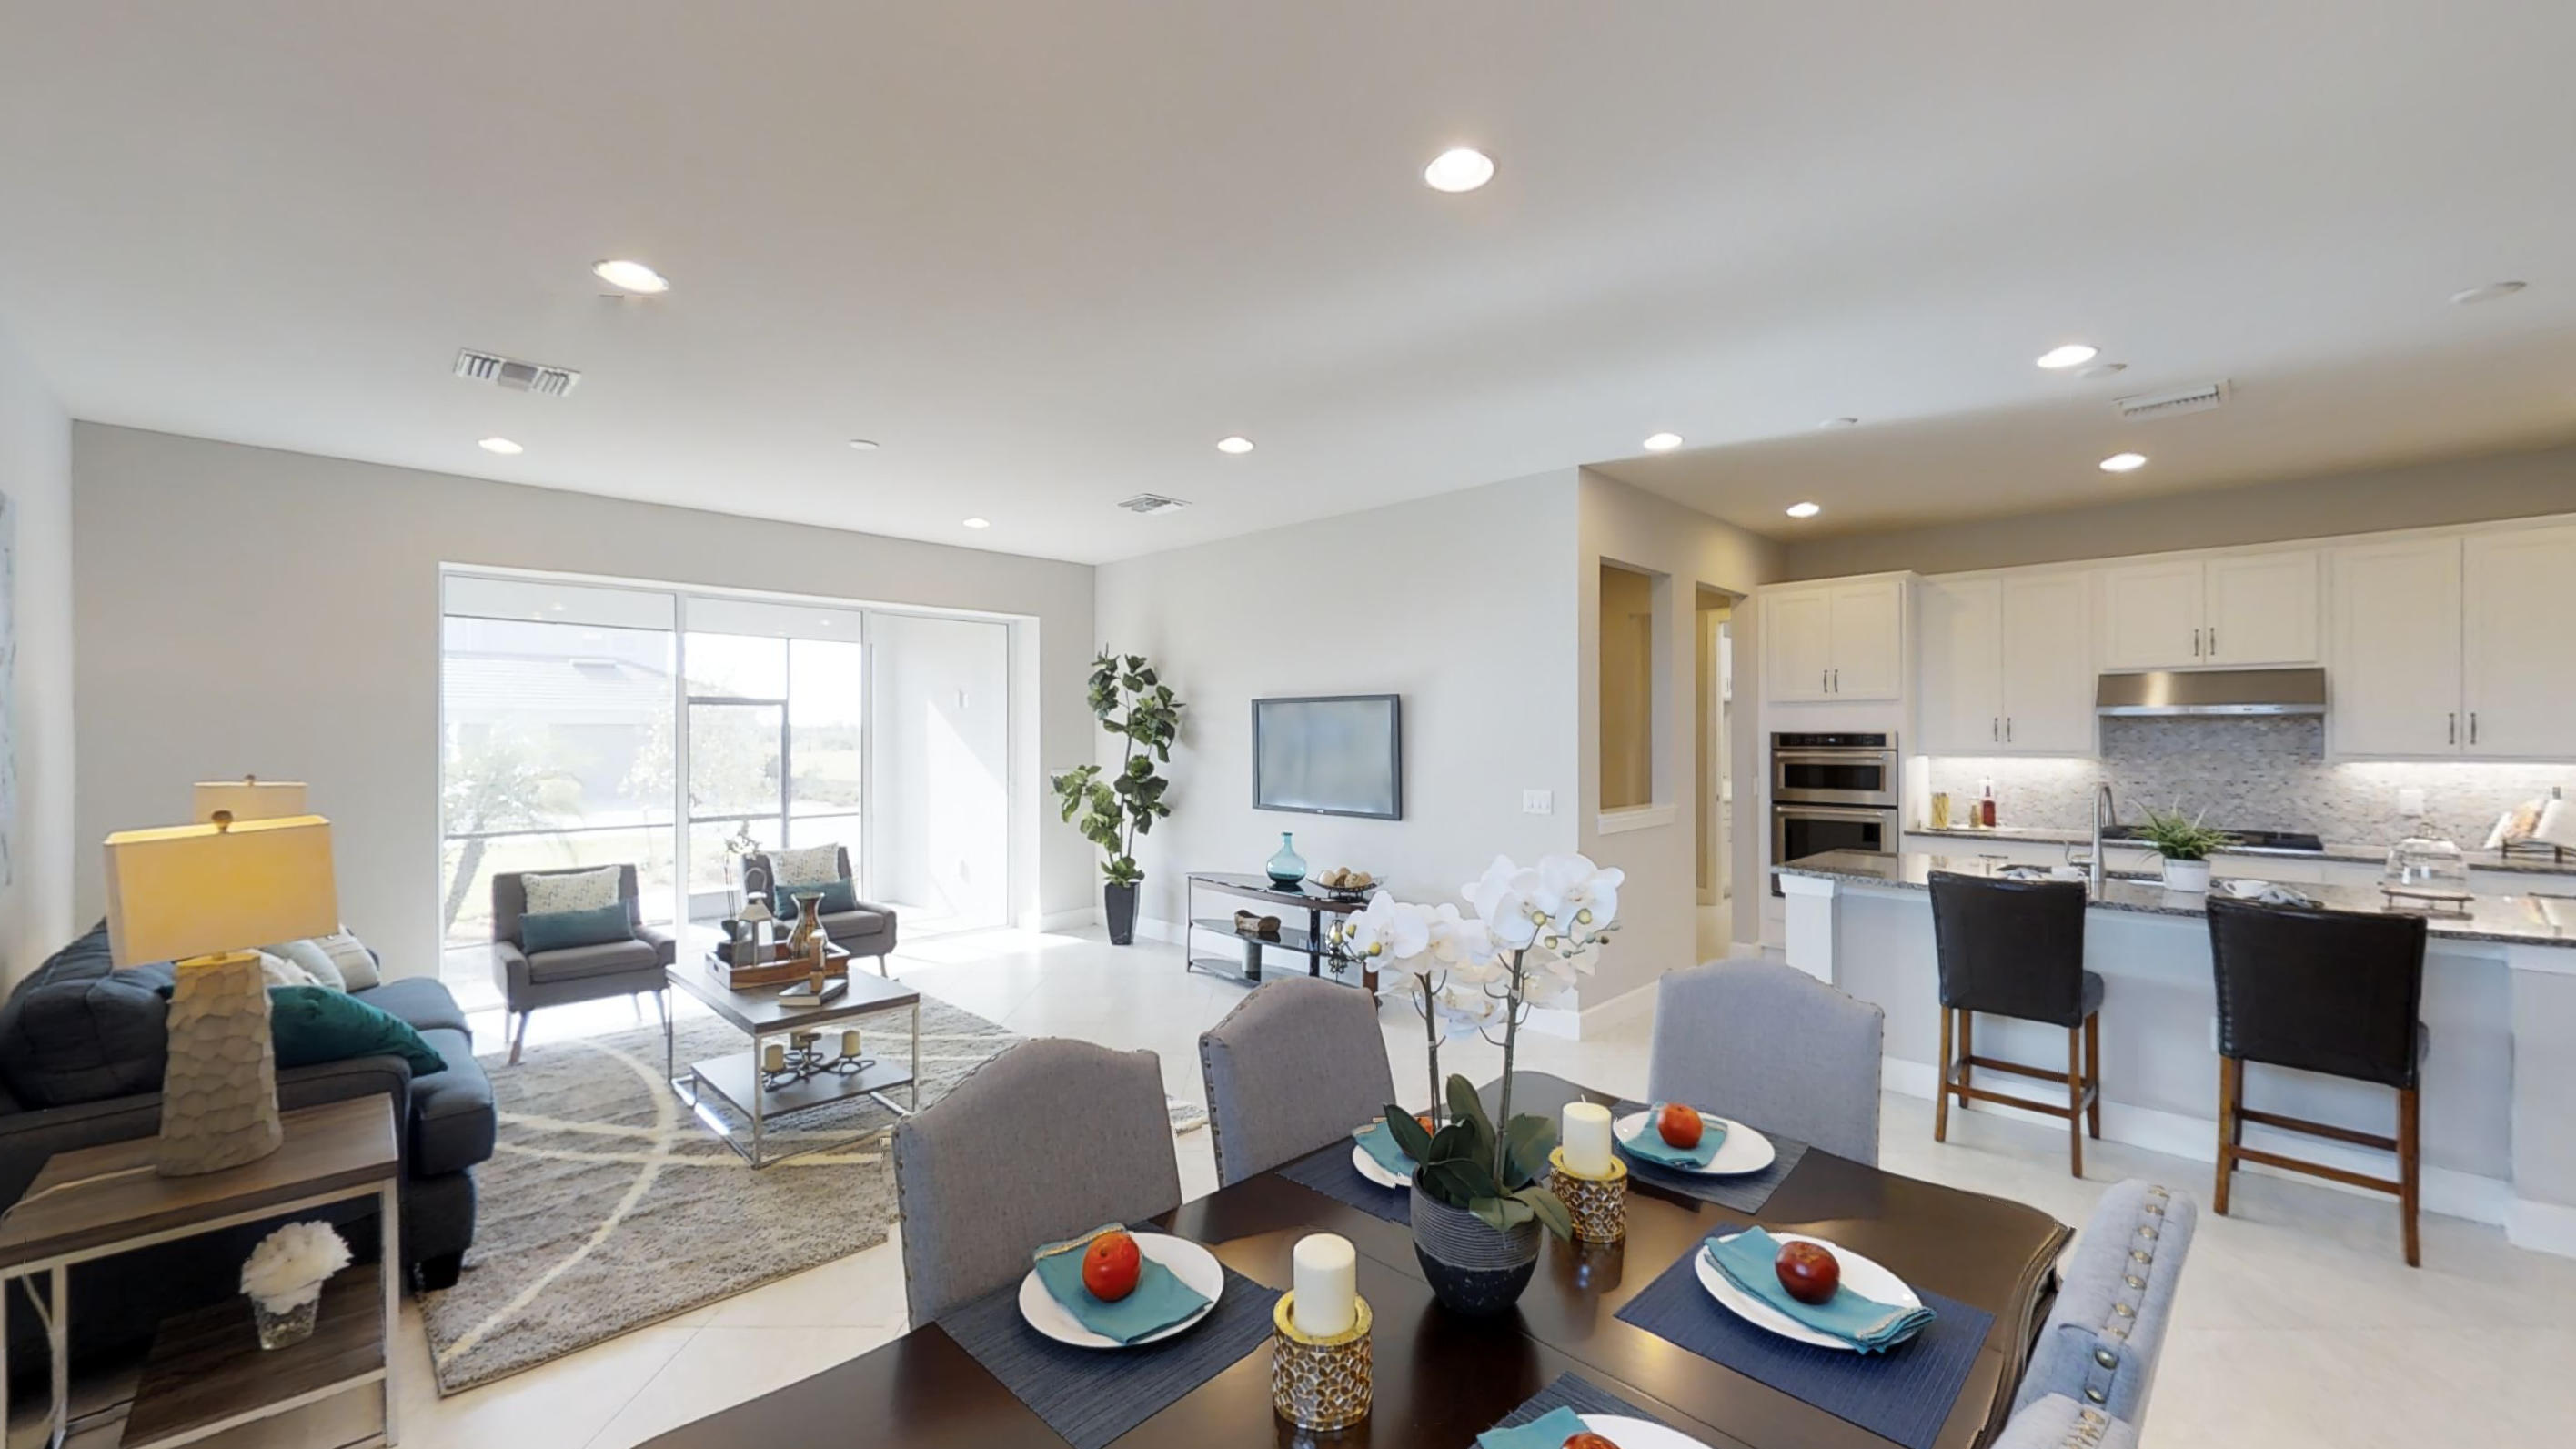 Pulte Homes: Arbordale Model